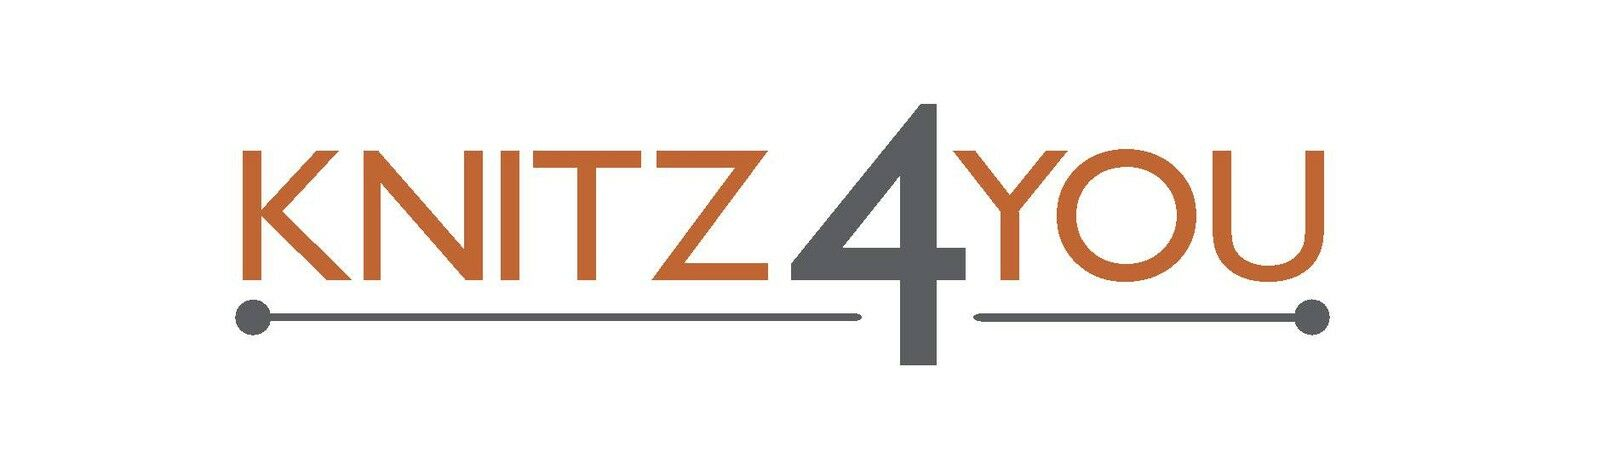 knitz4you